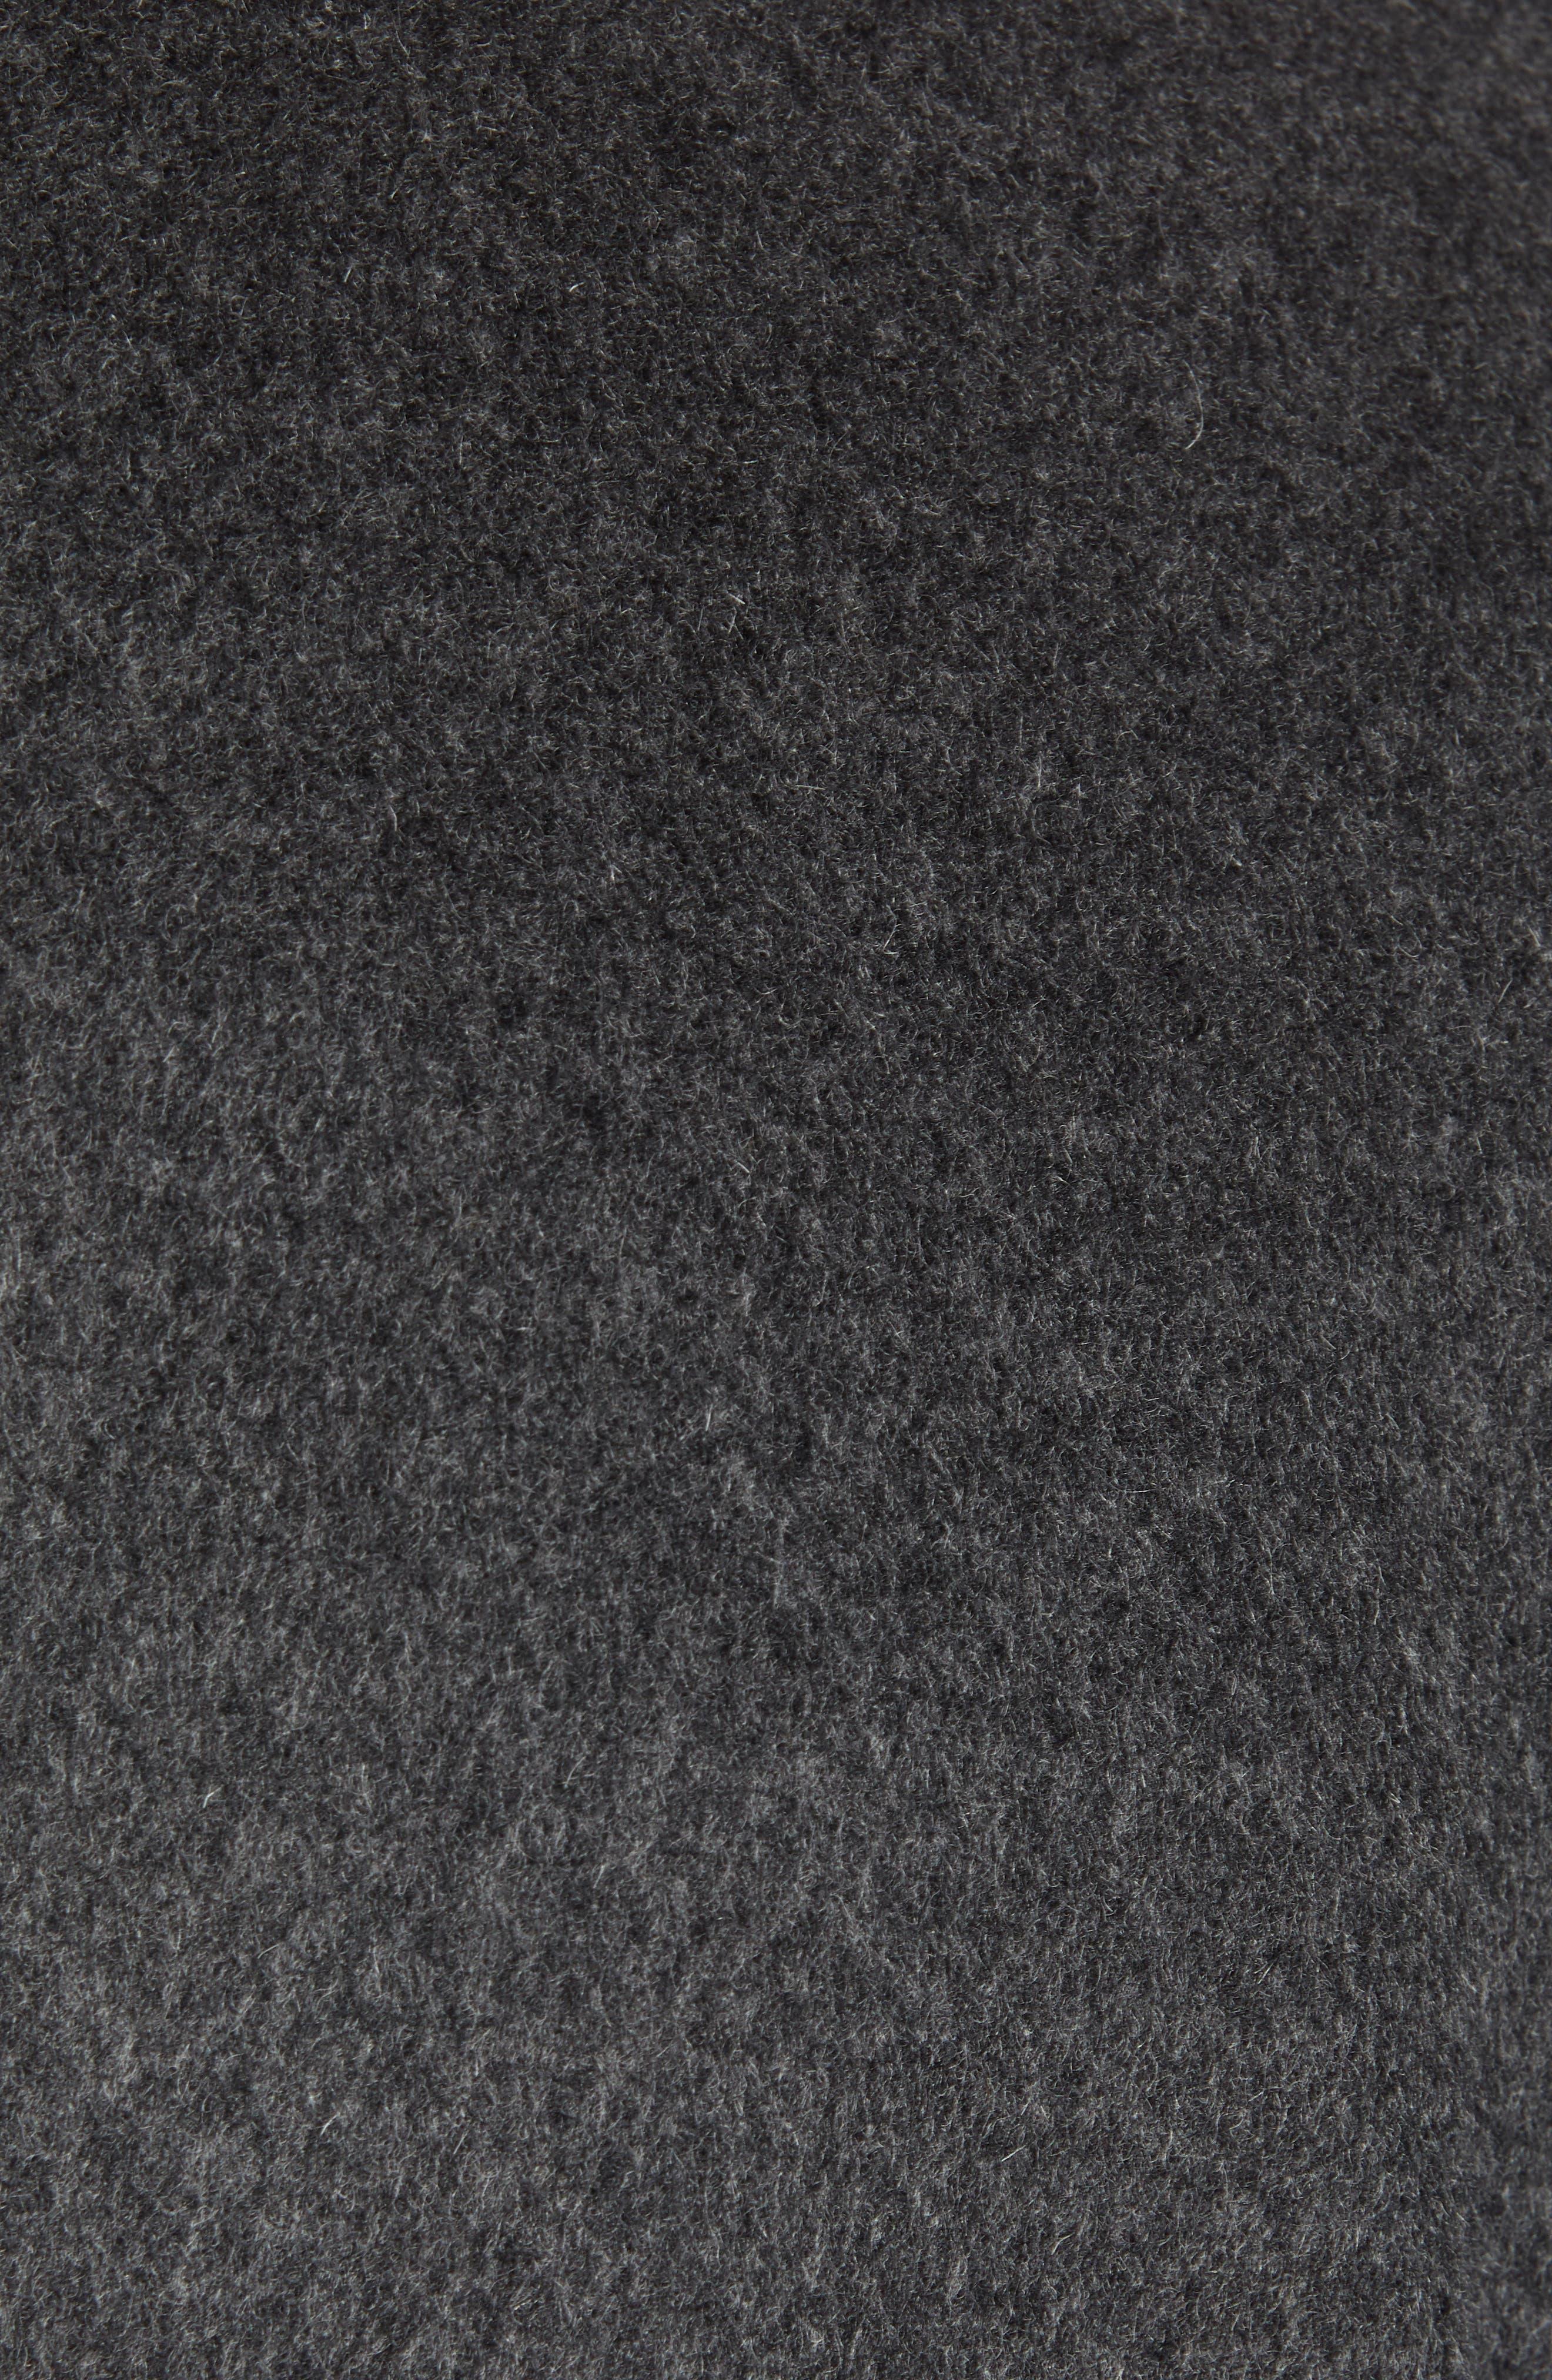 Mason Wool & Cashmere Overcoat,                             Alternate thumbnail 7, color,                             CHARCOAL